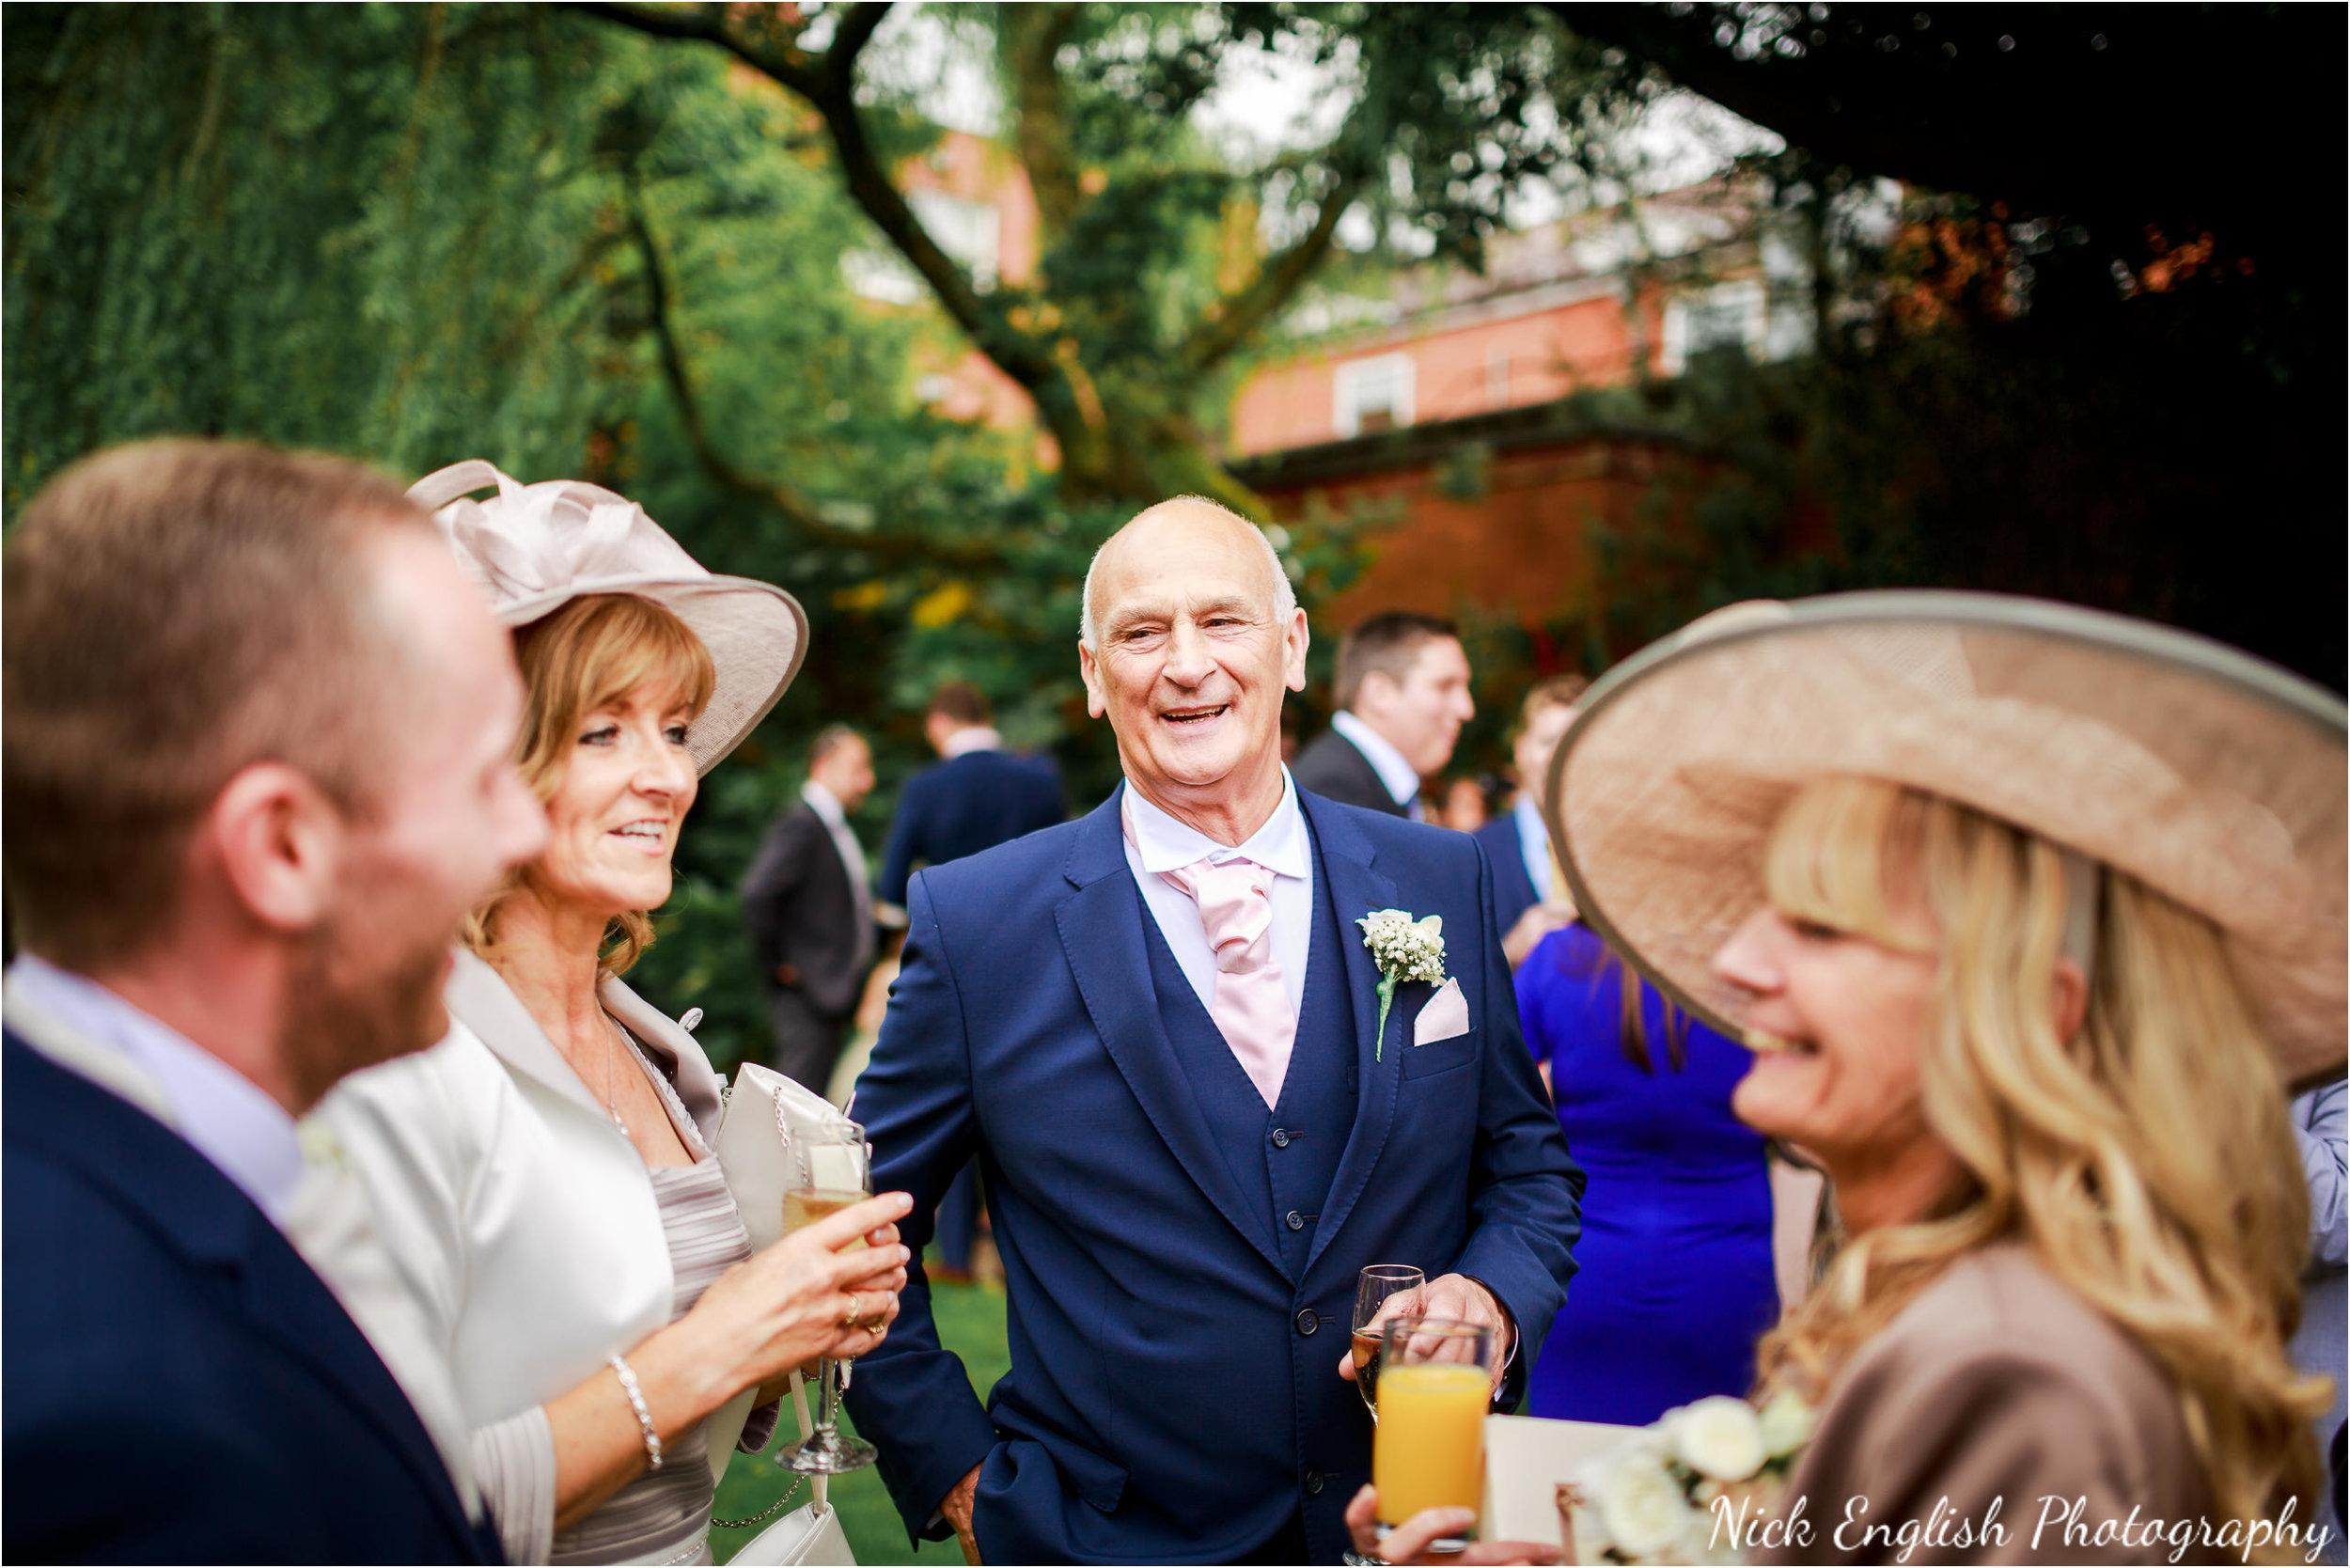 Emily David Wedding Photographs at Barton Grange Preston by Nick English Photography 101jpg.jpeg